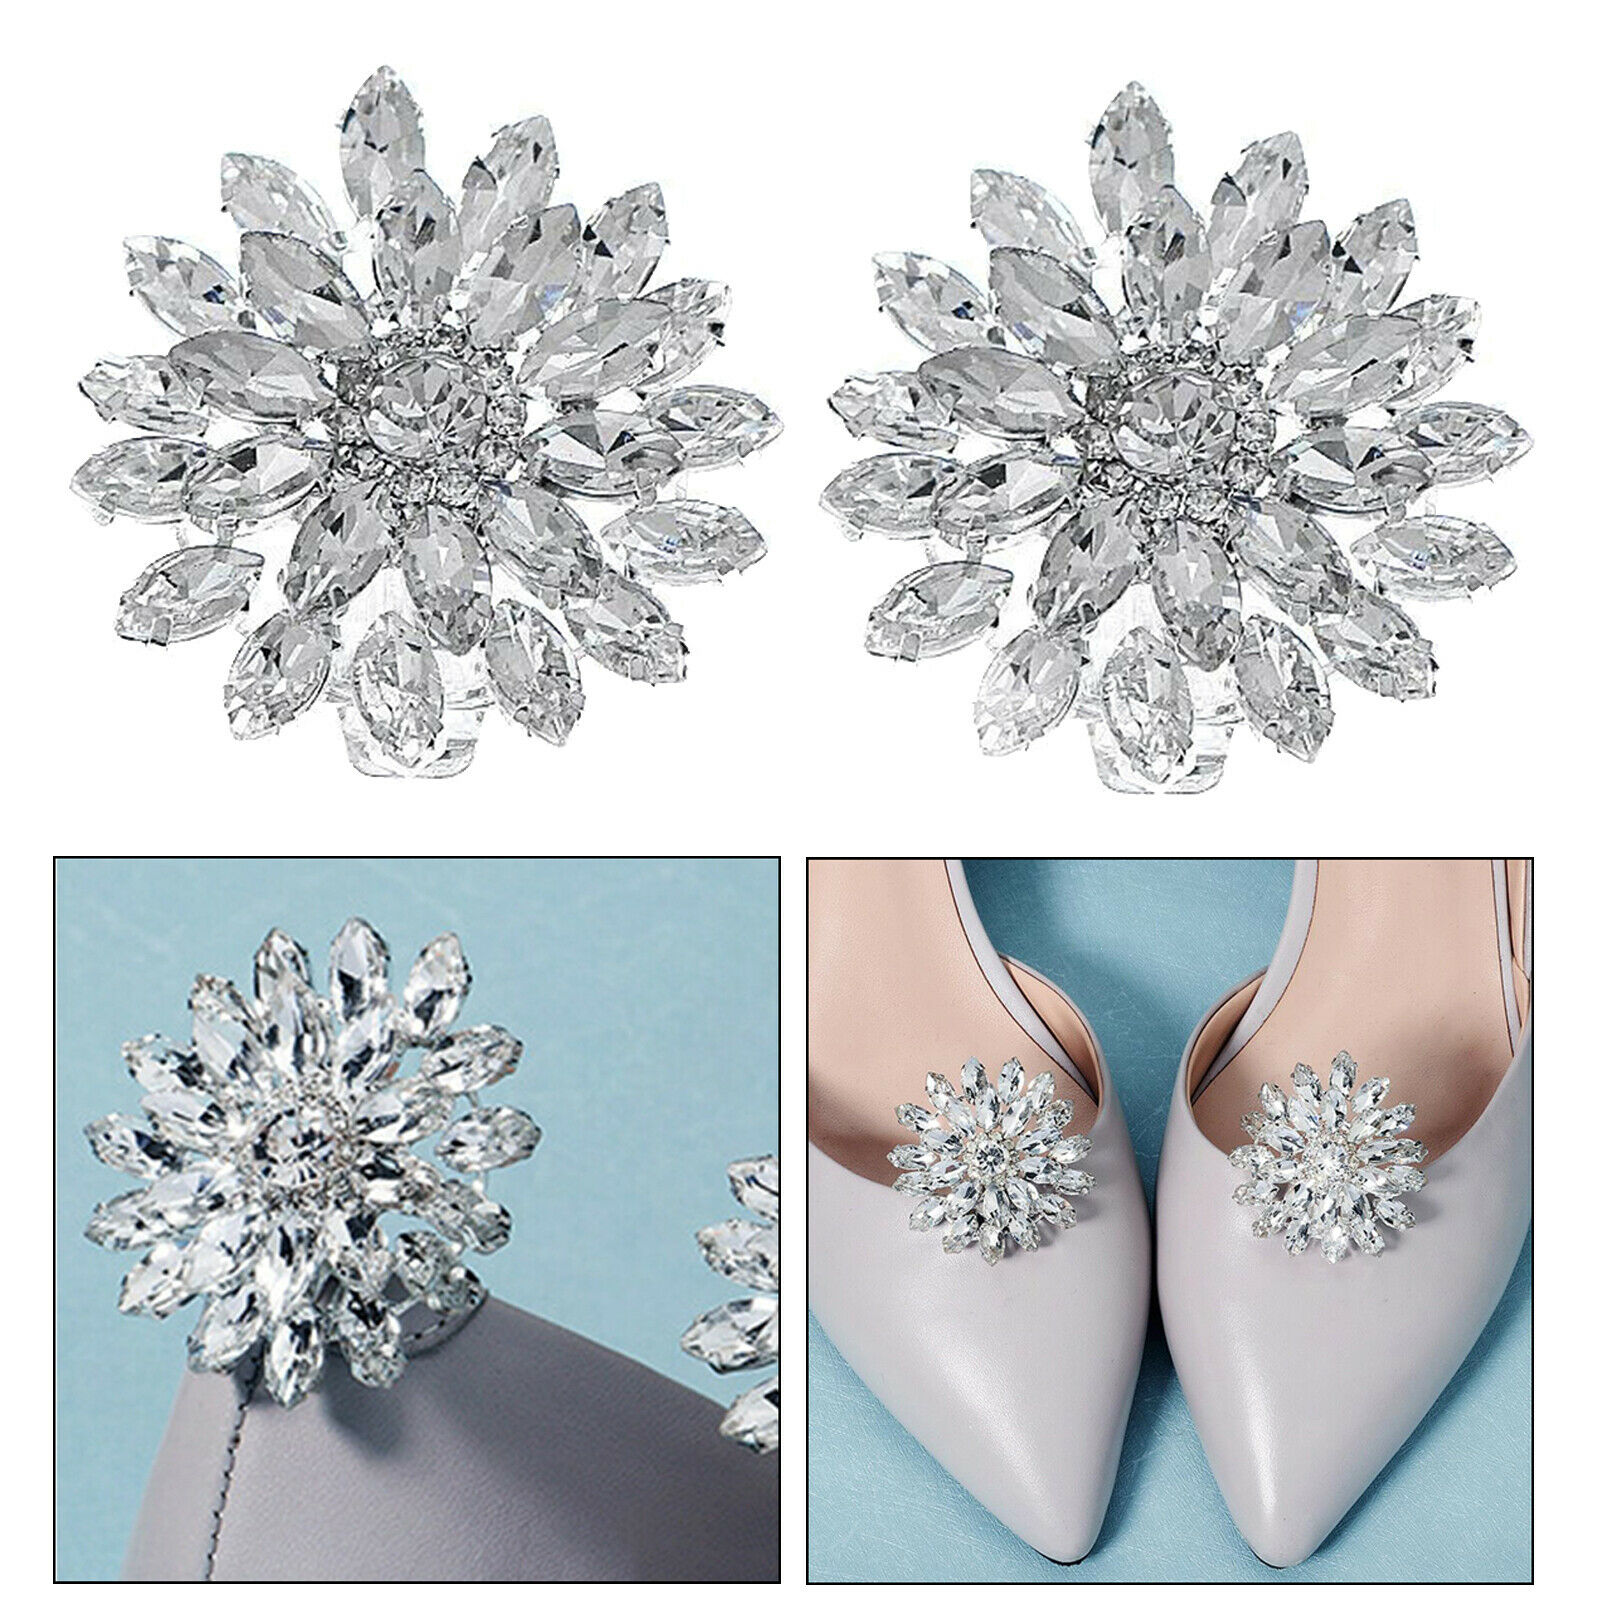 Rhinestone Crystal Sparkle Shoes Clips Vintage Decor Wedding Bridal